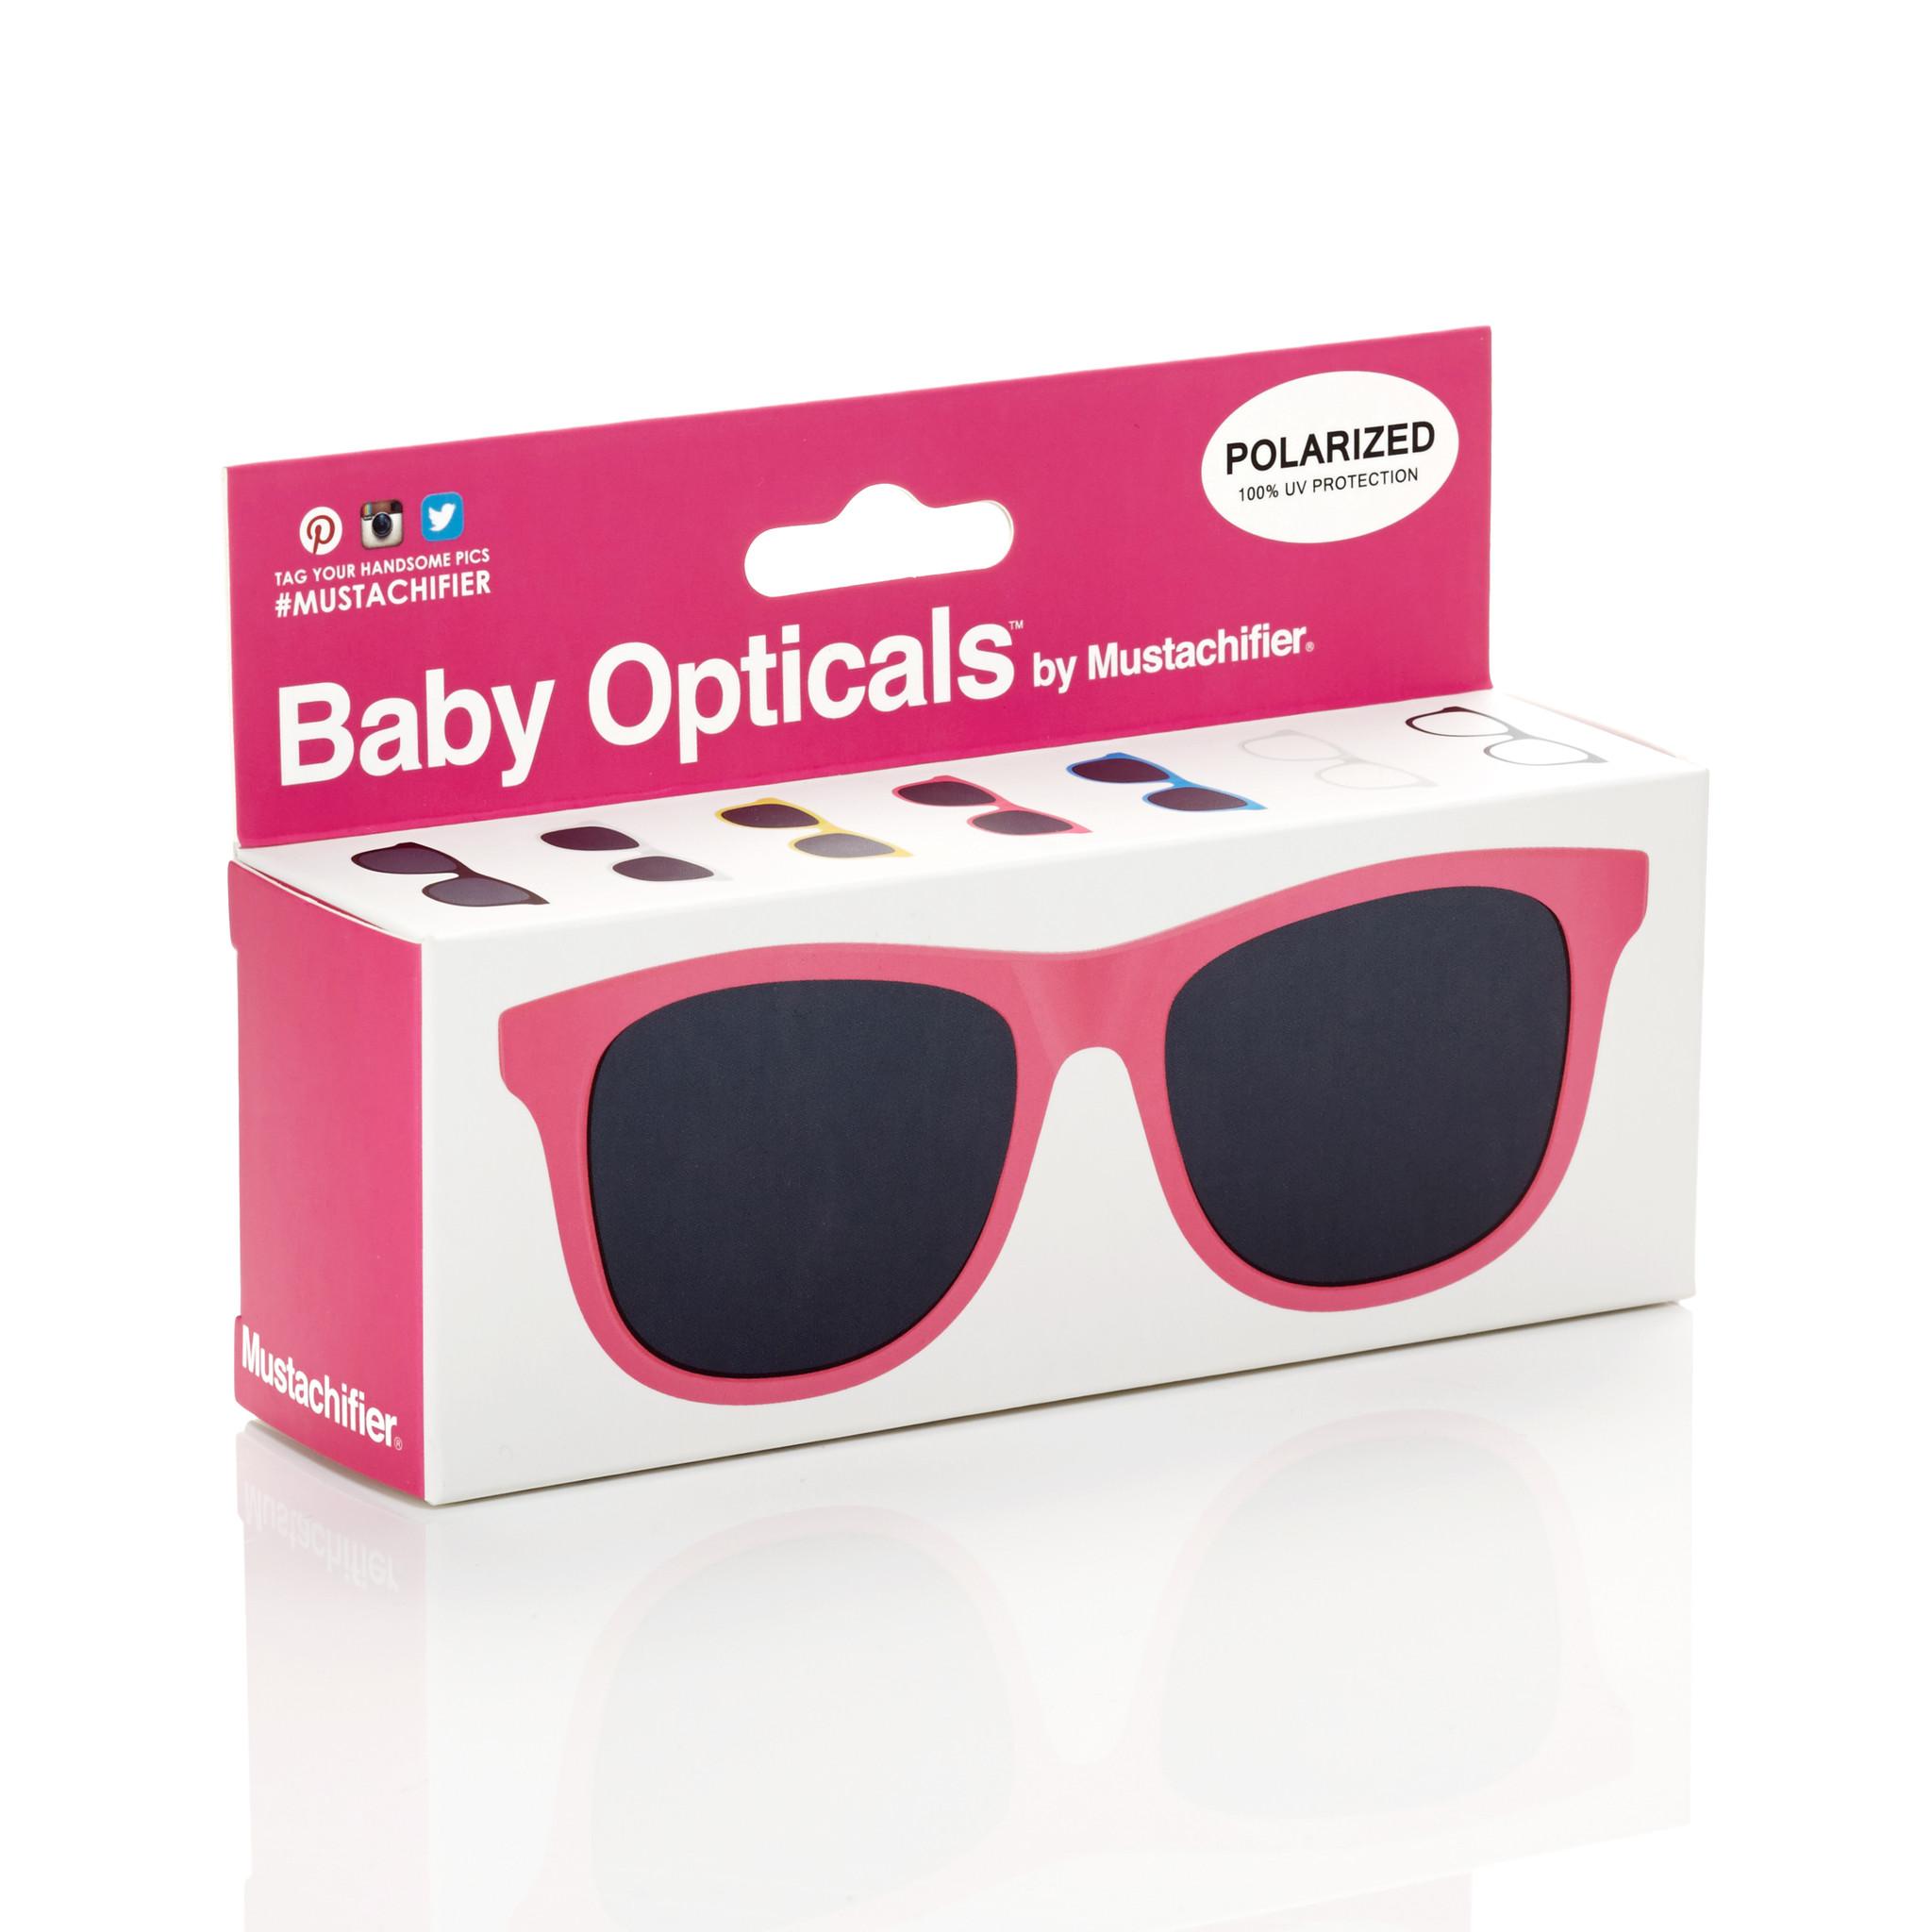 Mustachifier Pink Sunglasses Age 0-2 แว่นกันแดดเด็กสีชมพู